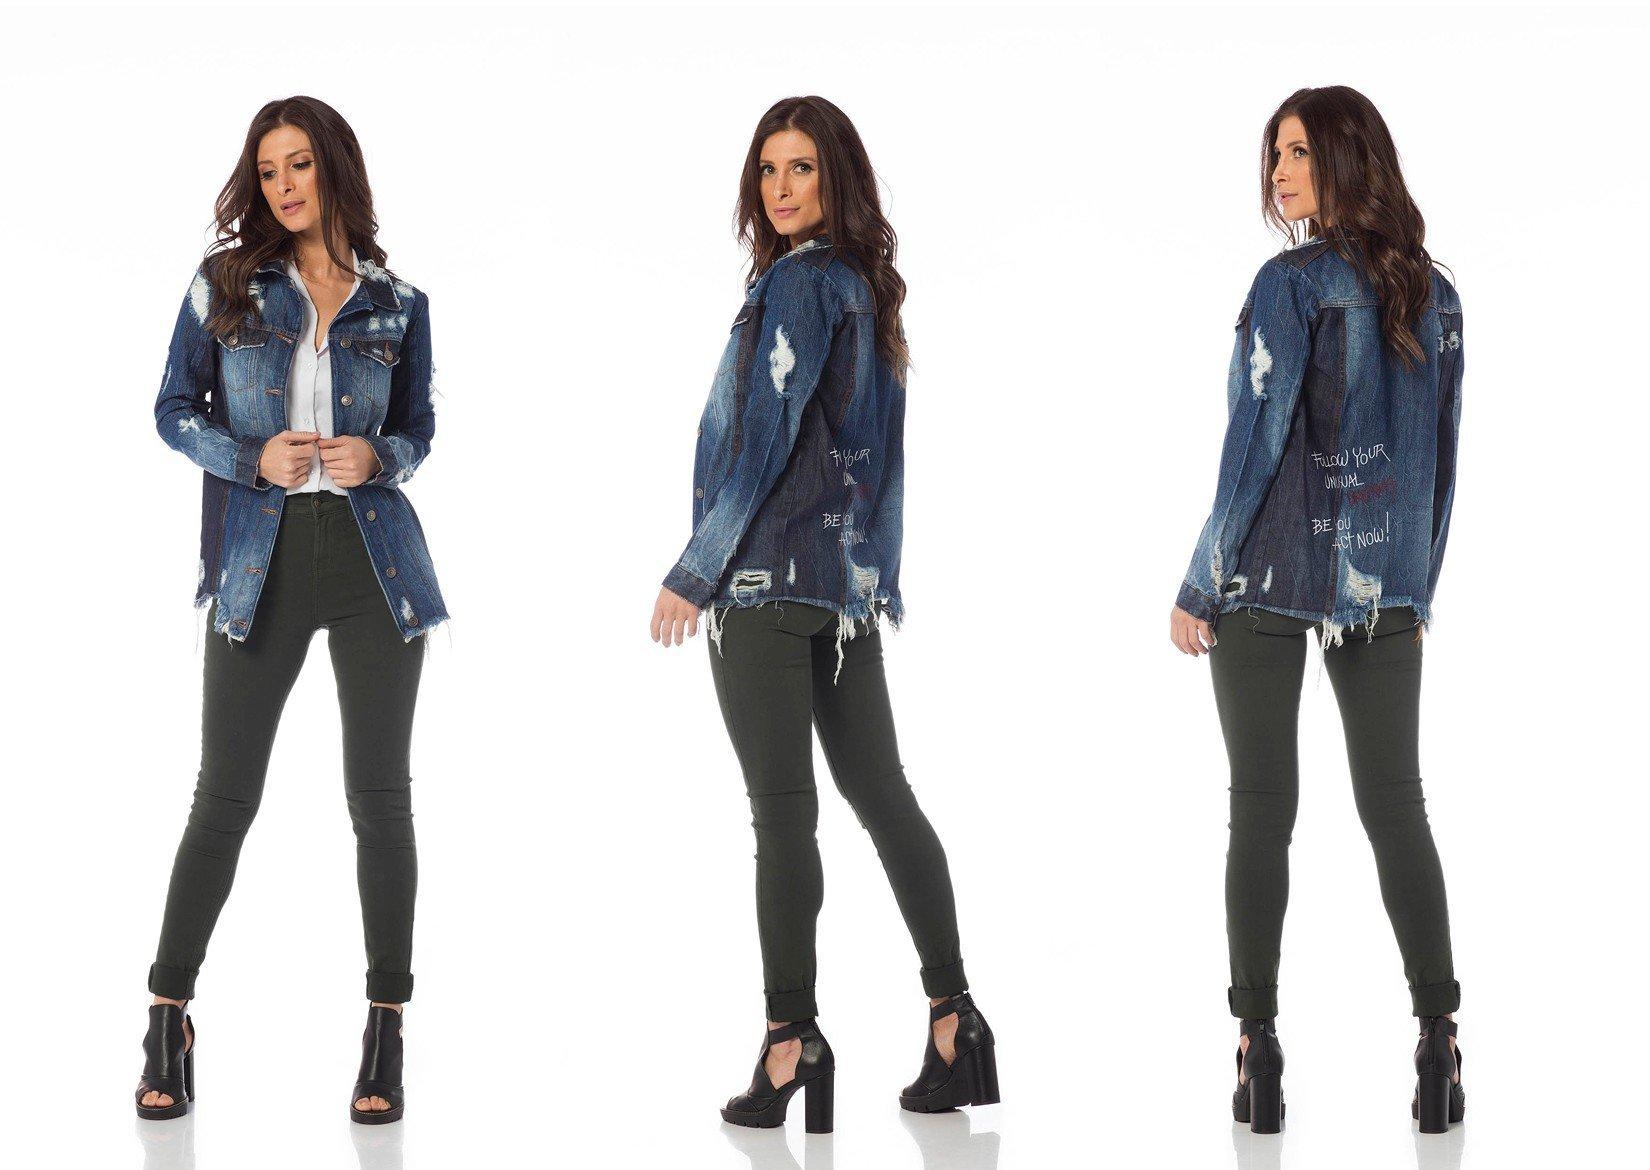 jaqueta jeans oversize com rasgos dz9075 tripla denim zero